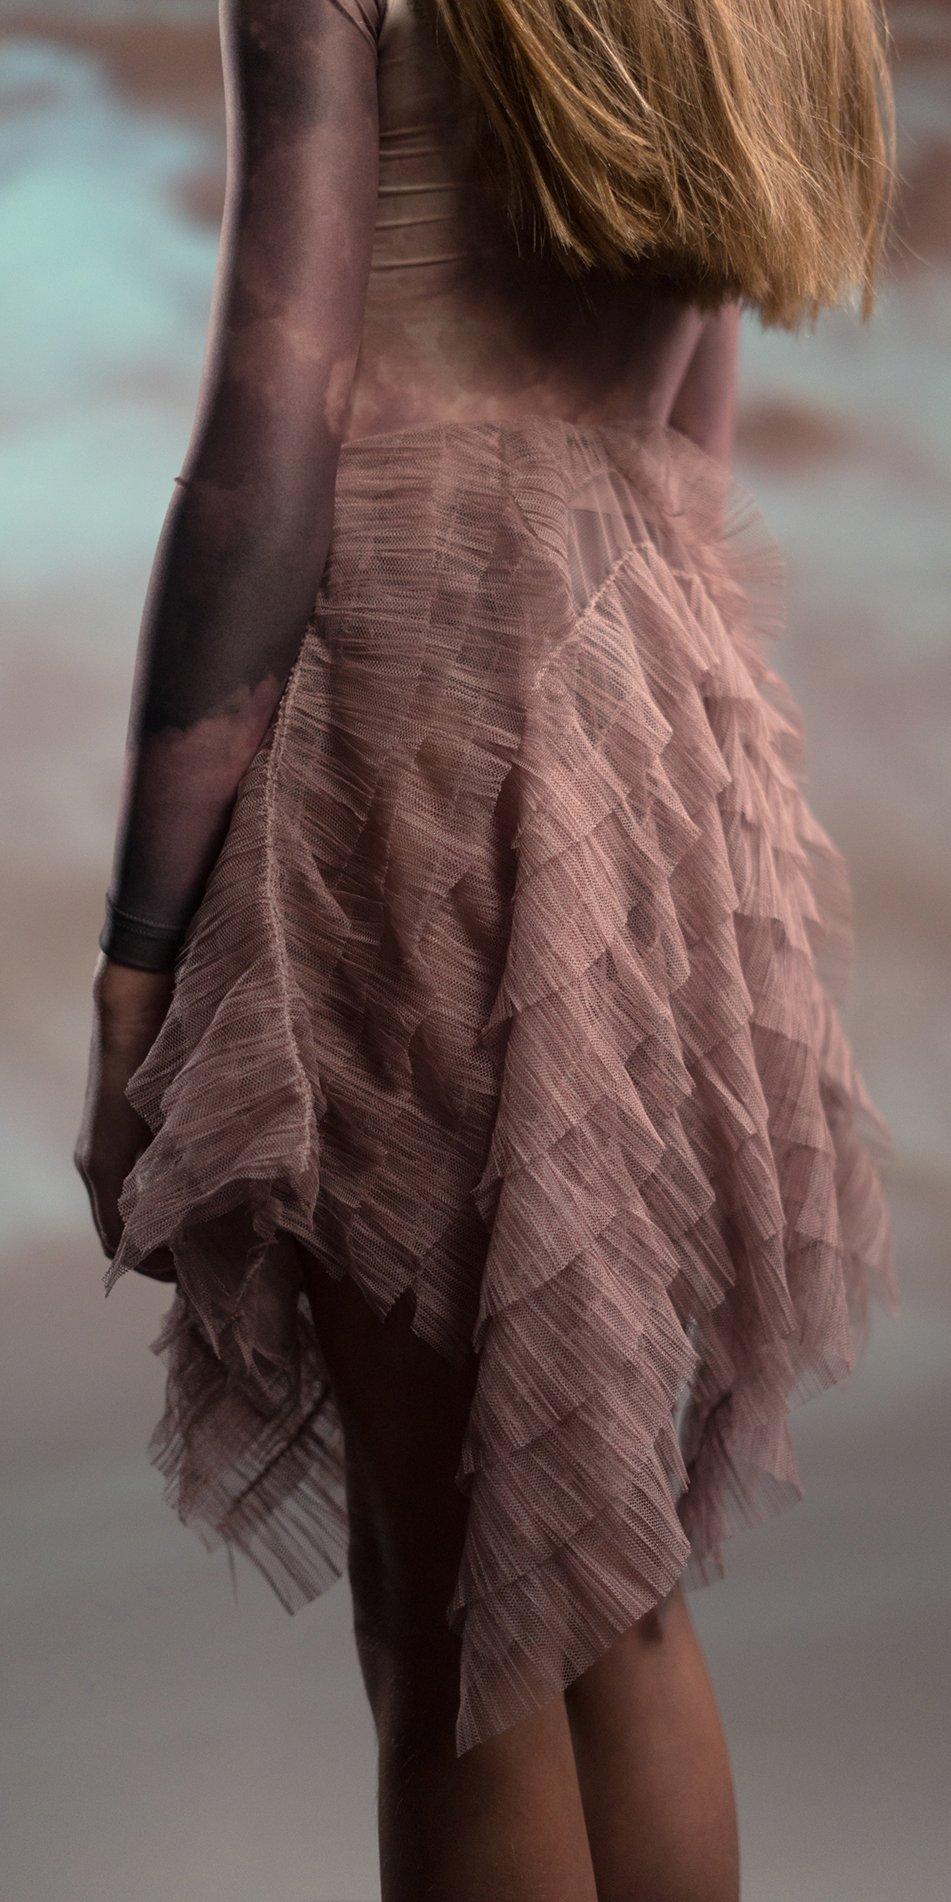 JUNIOR MILLE FEUILLE short square skirt 1